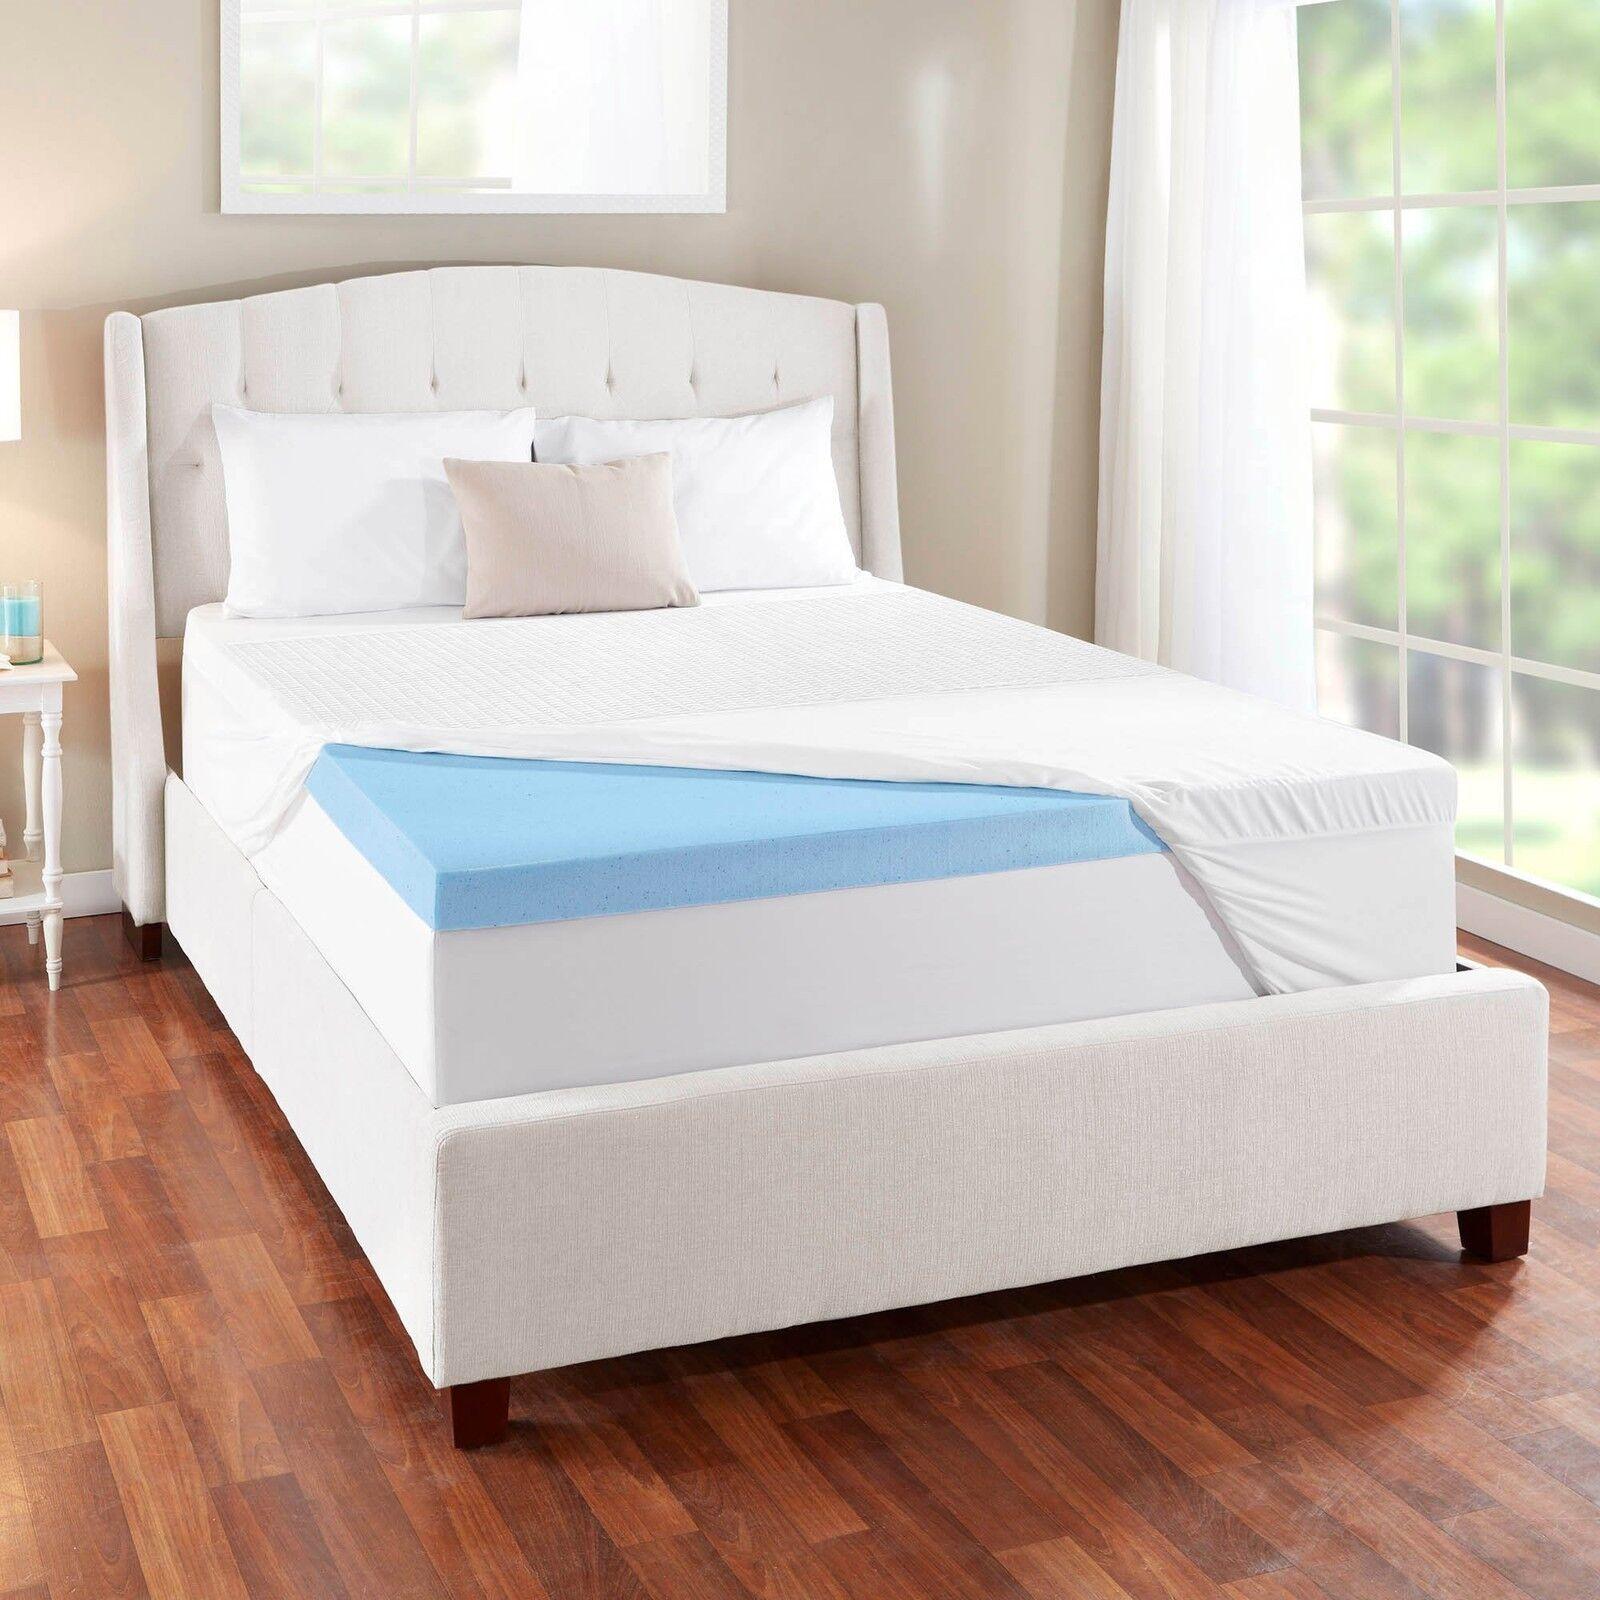 novaform 14 comfort grande queen gel memory foam mattress. novaform 3 evencor gelplus gel memory foam mattress topper with cooling cover 14 comfort grande queen